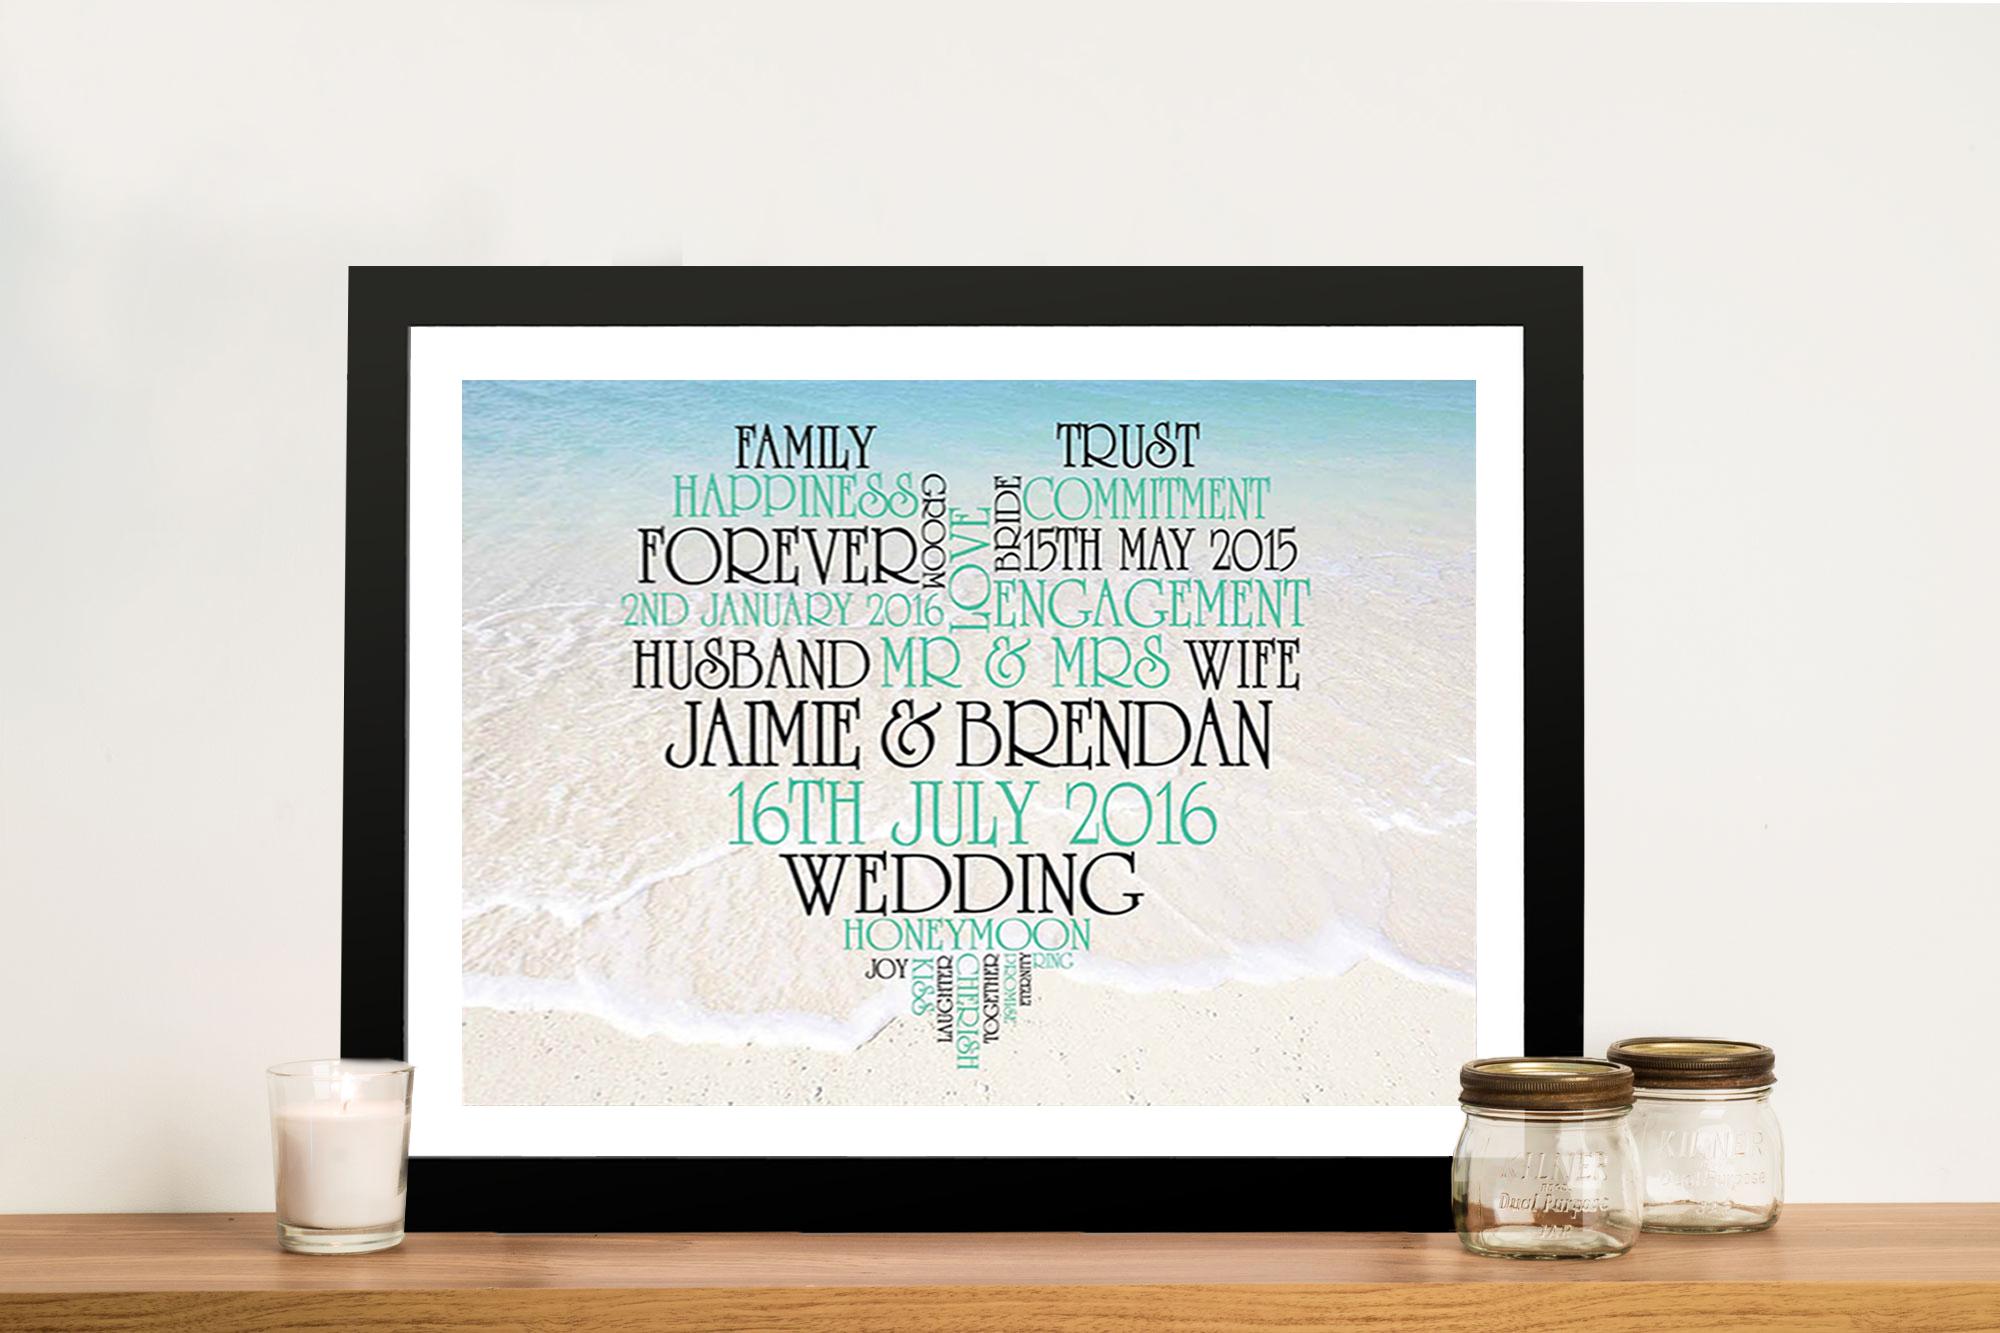 Personalised Heart Framed Artwork | Photo Background Love Heart